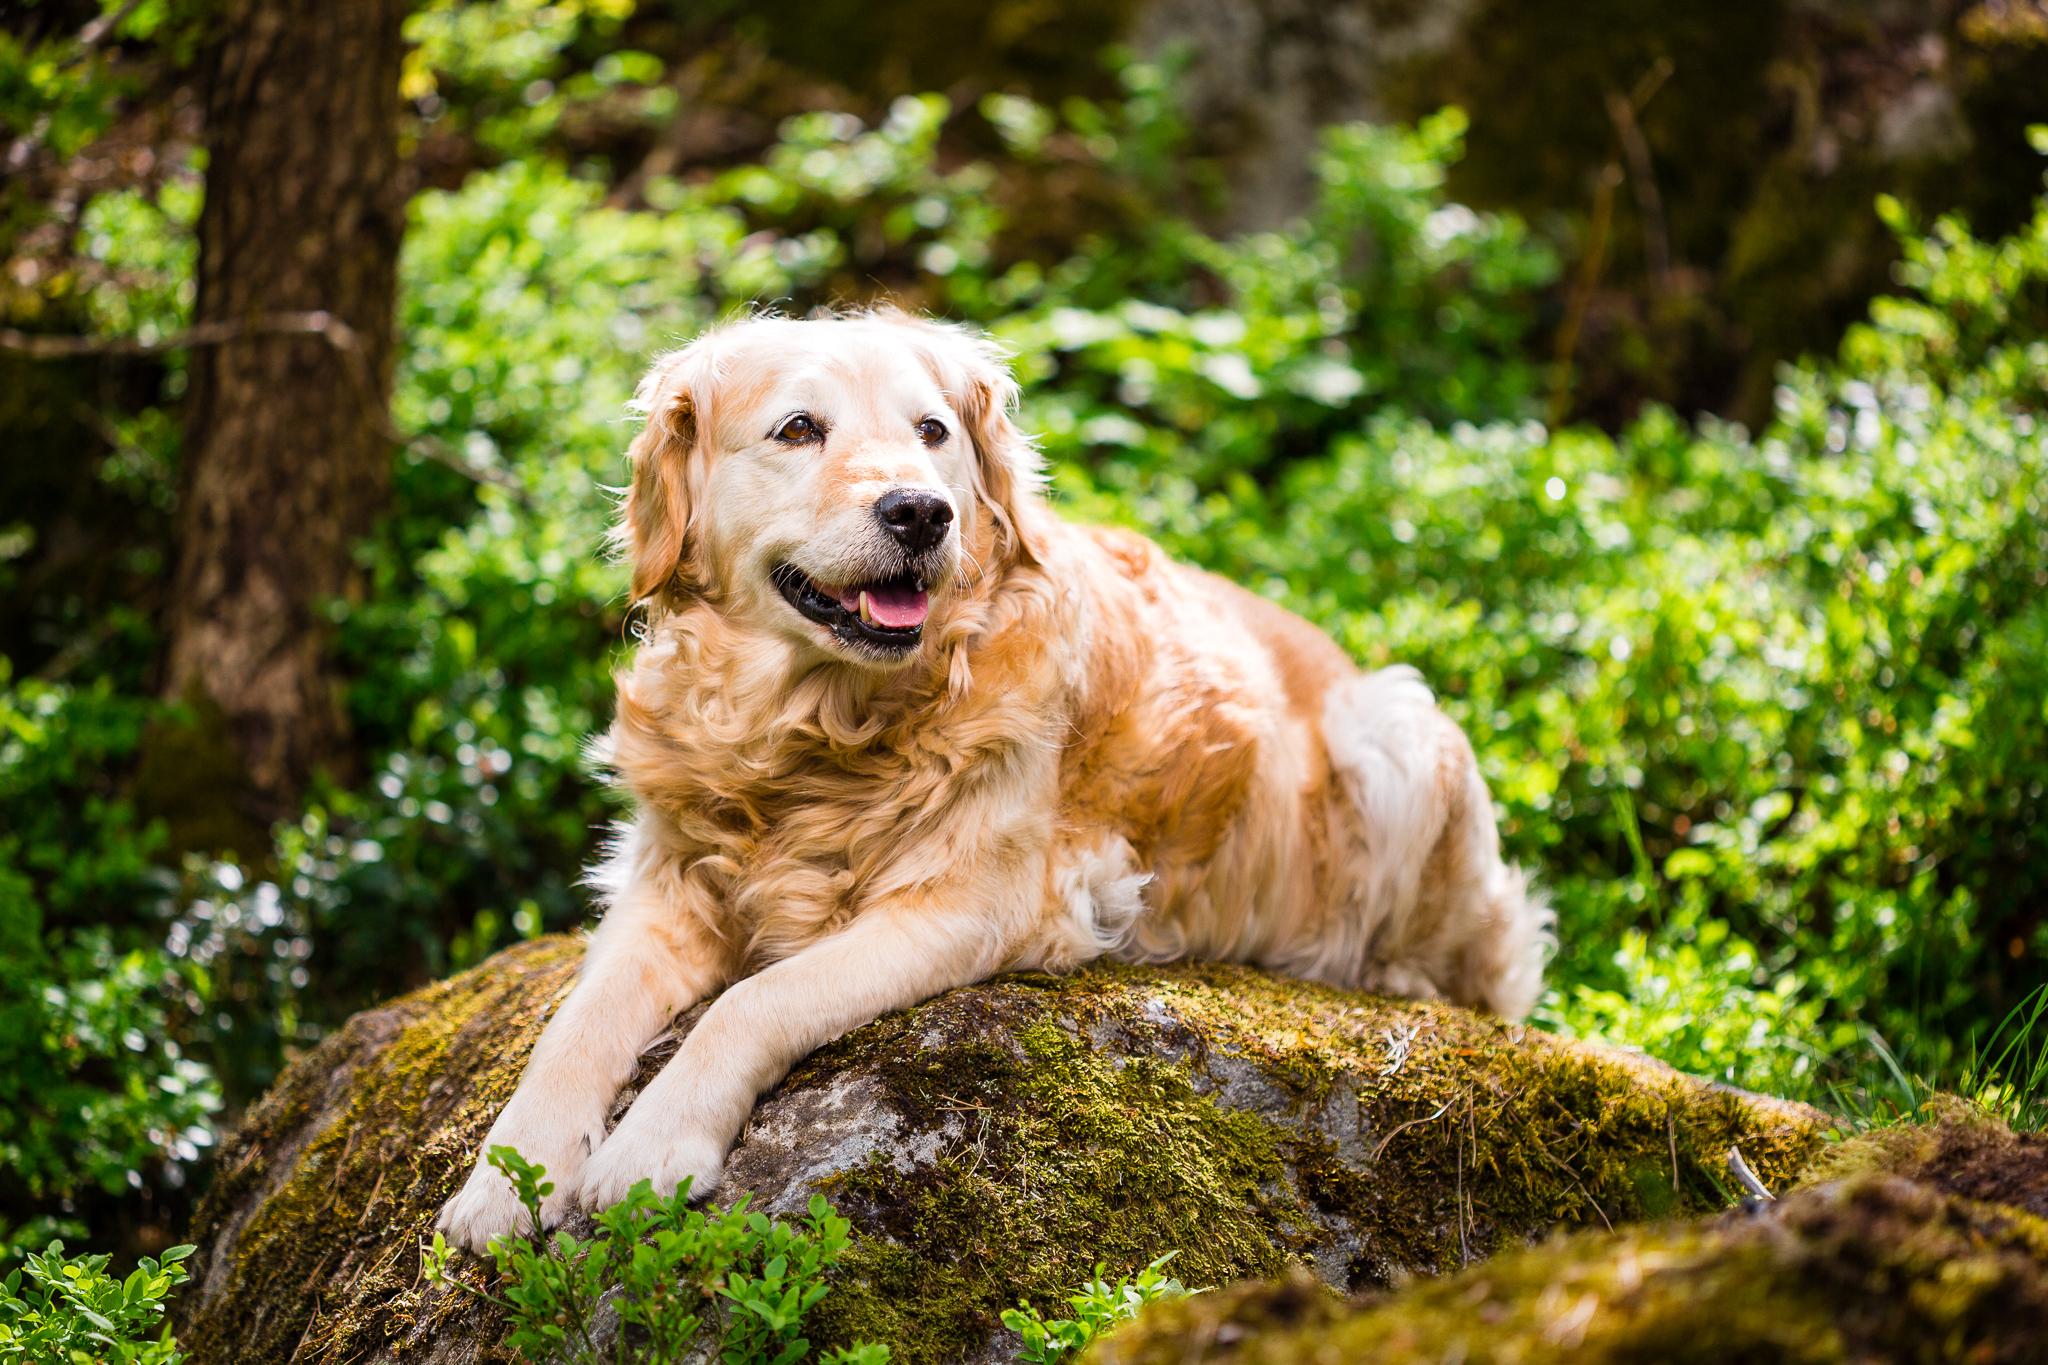 Tassa, my neighbours dog